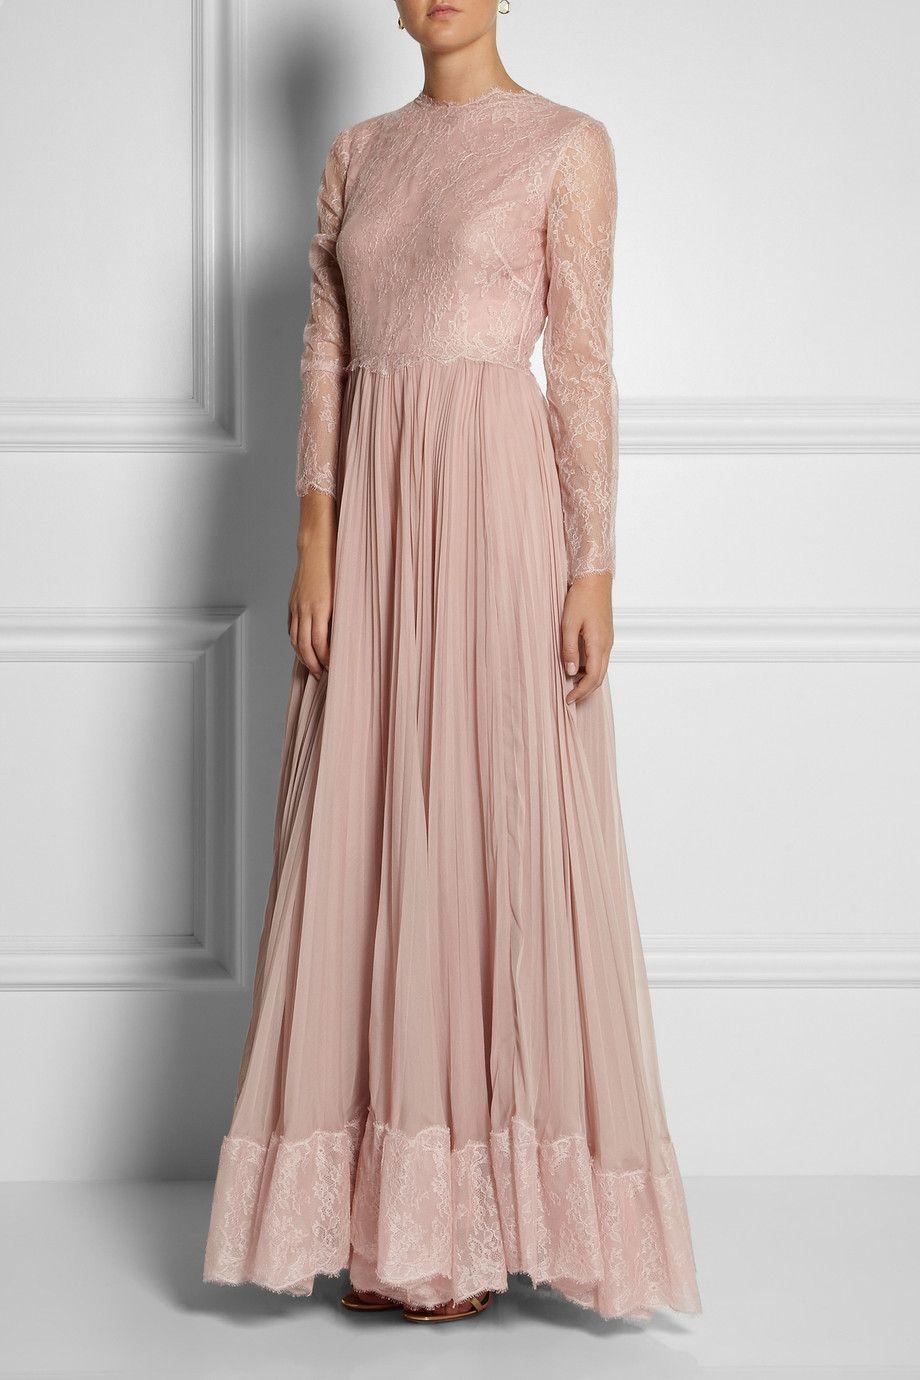 Valentino | Lace and silk gown | NET-A-PORTER.COM | Vestidos ...